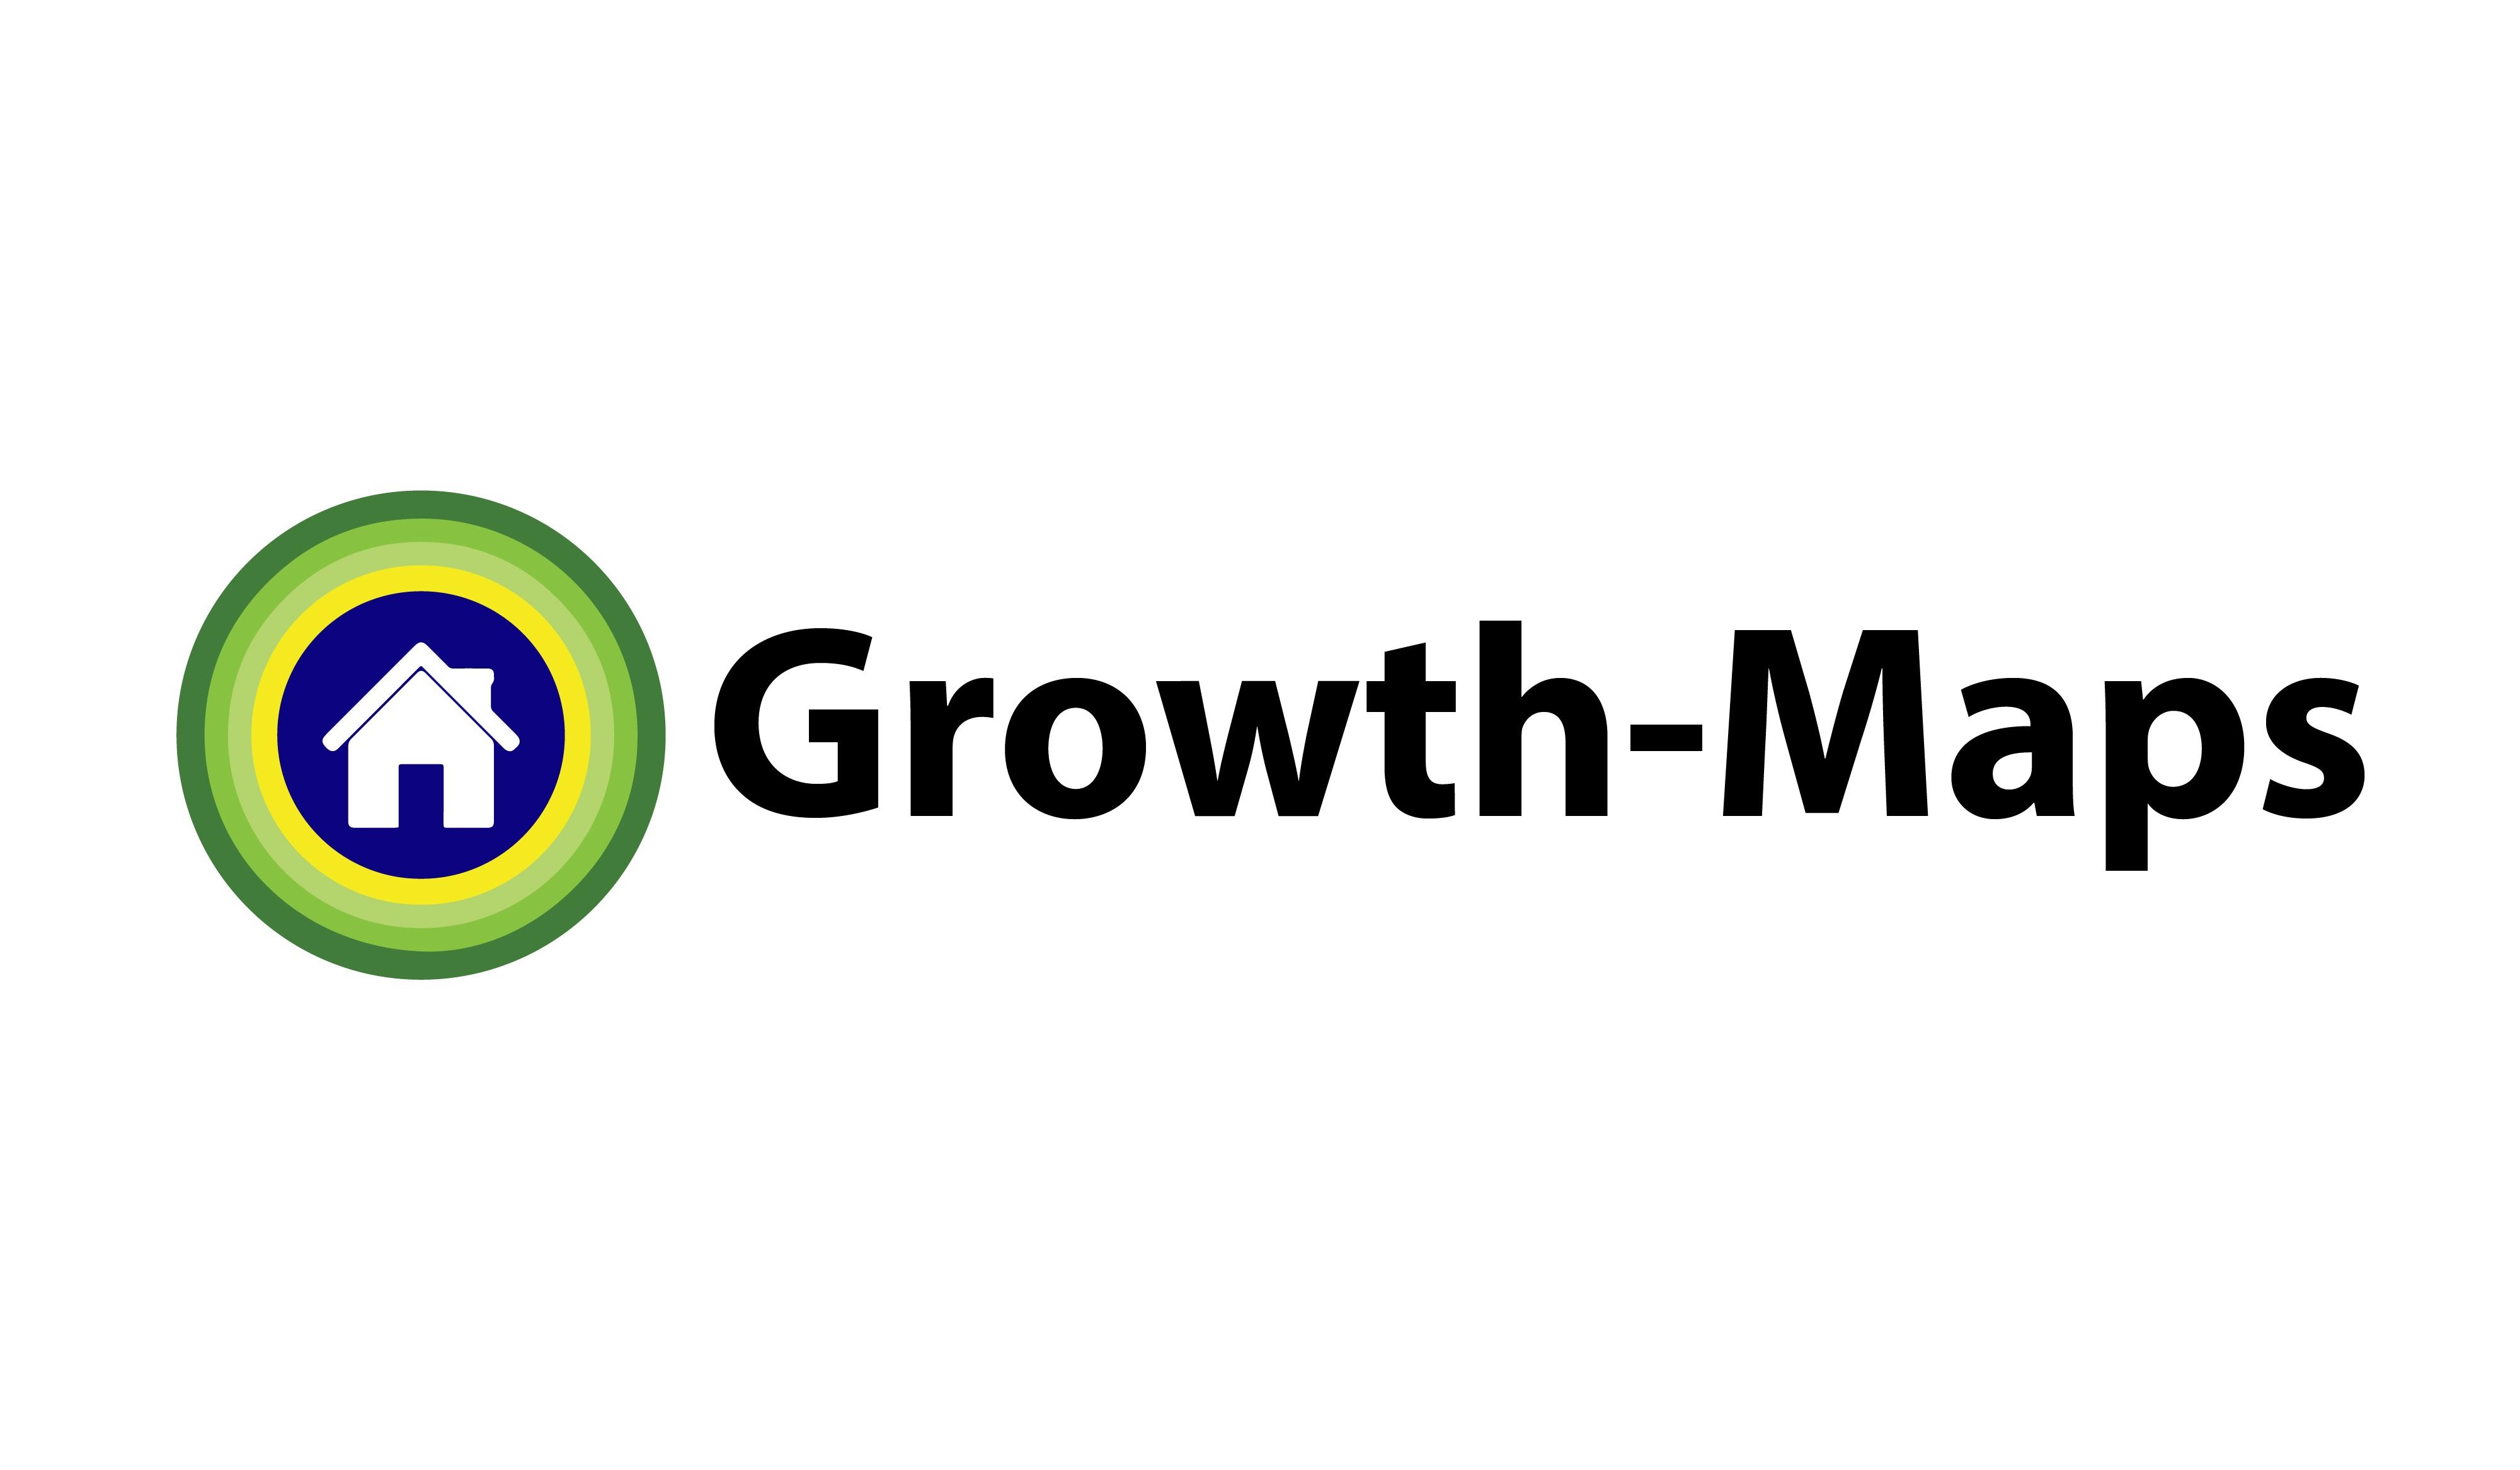 Growth-Maps logo